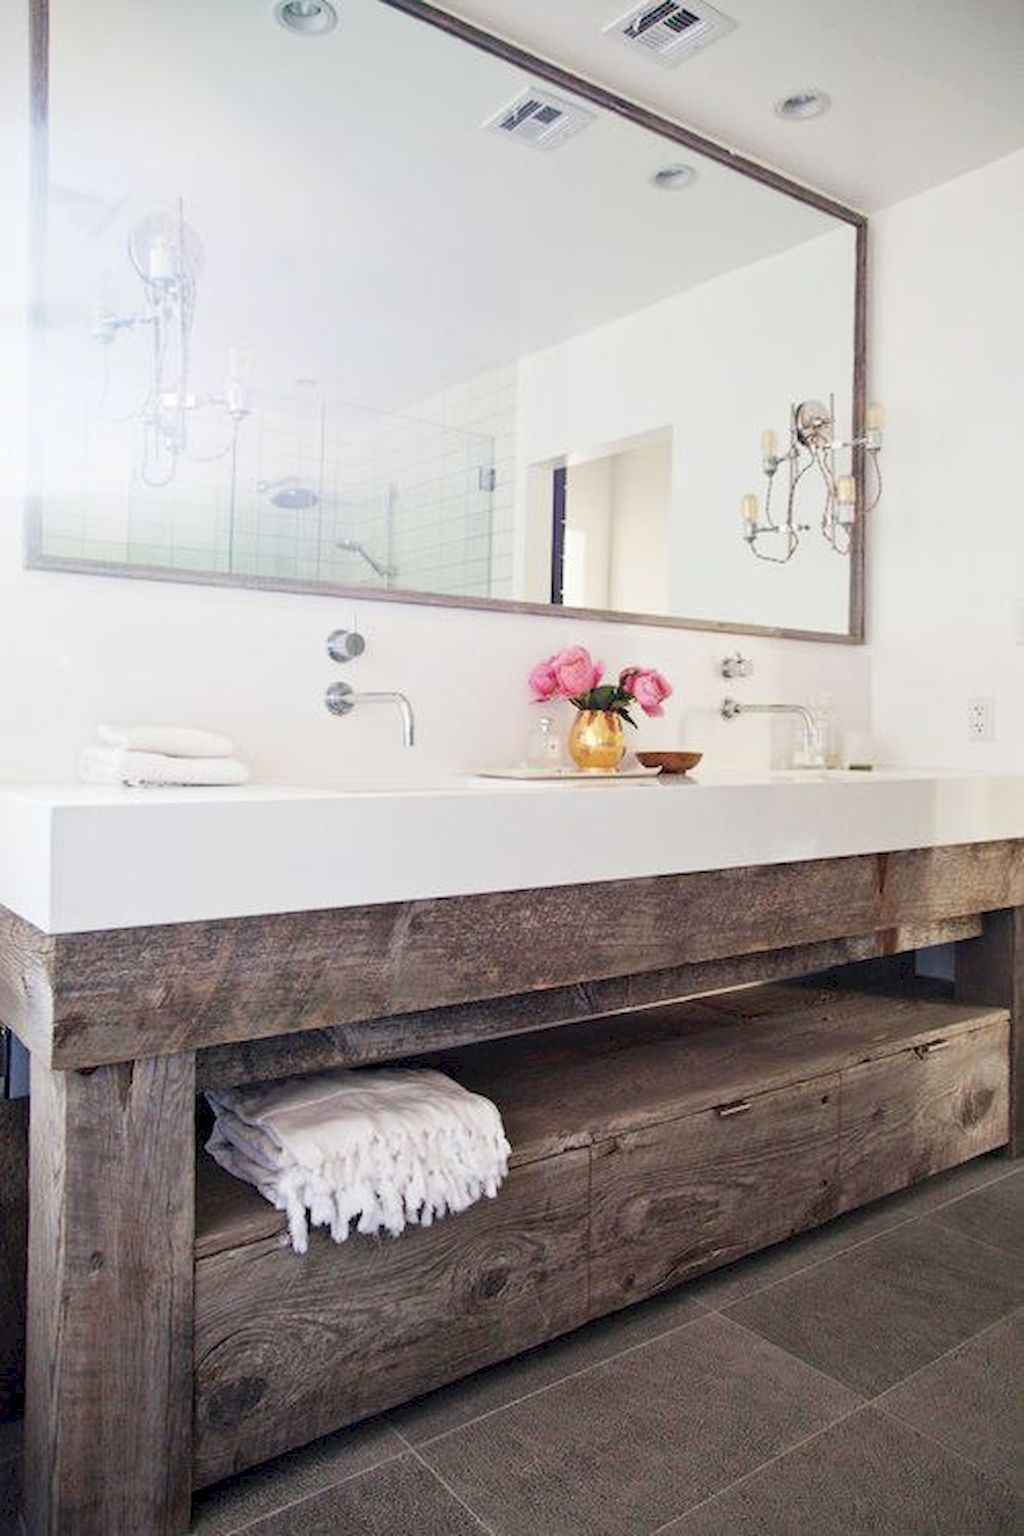 Inspiring rustic bathroom decor ideas (14)